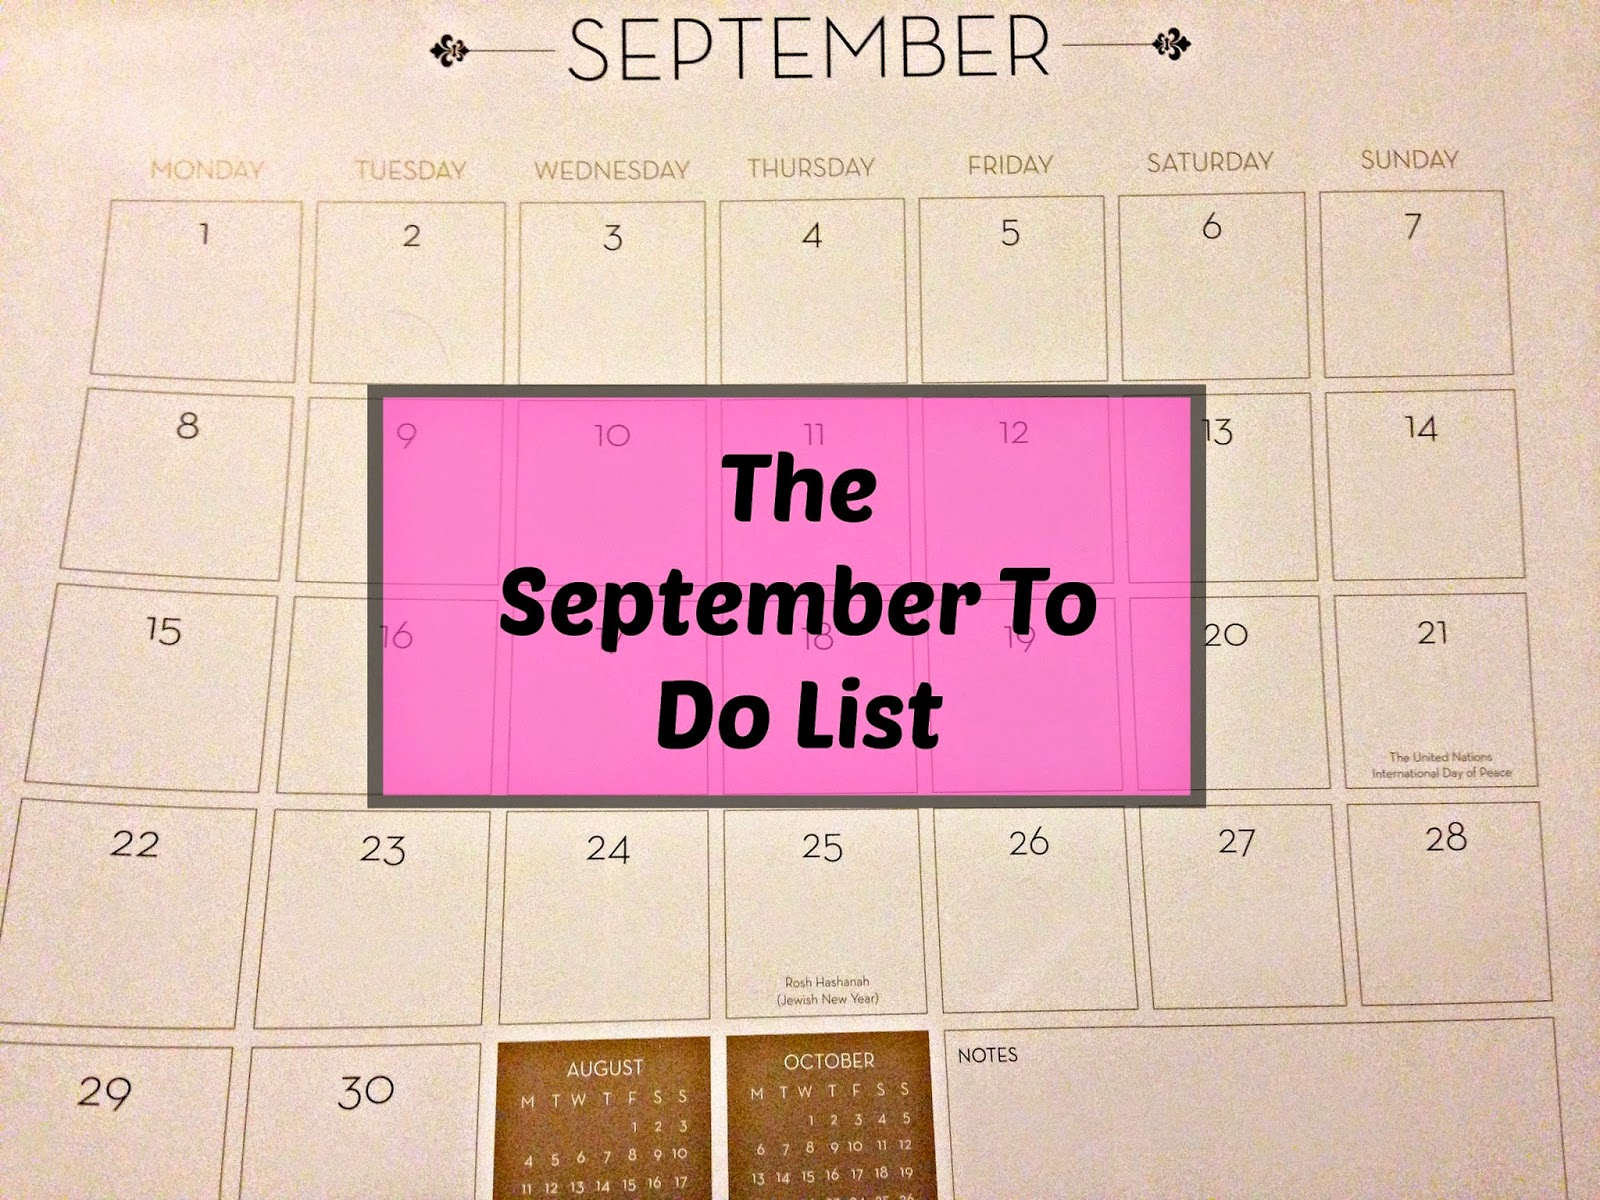 The September To Do List